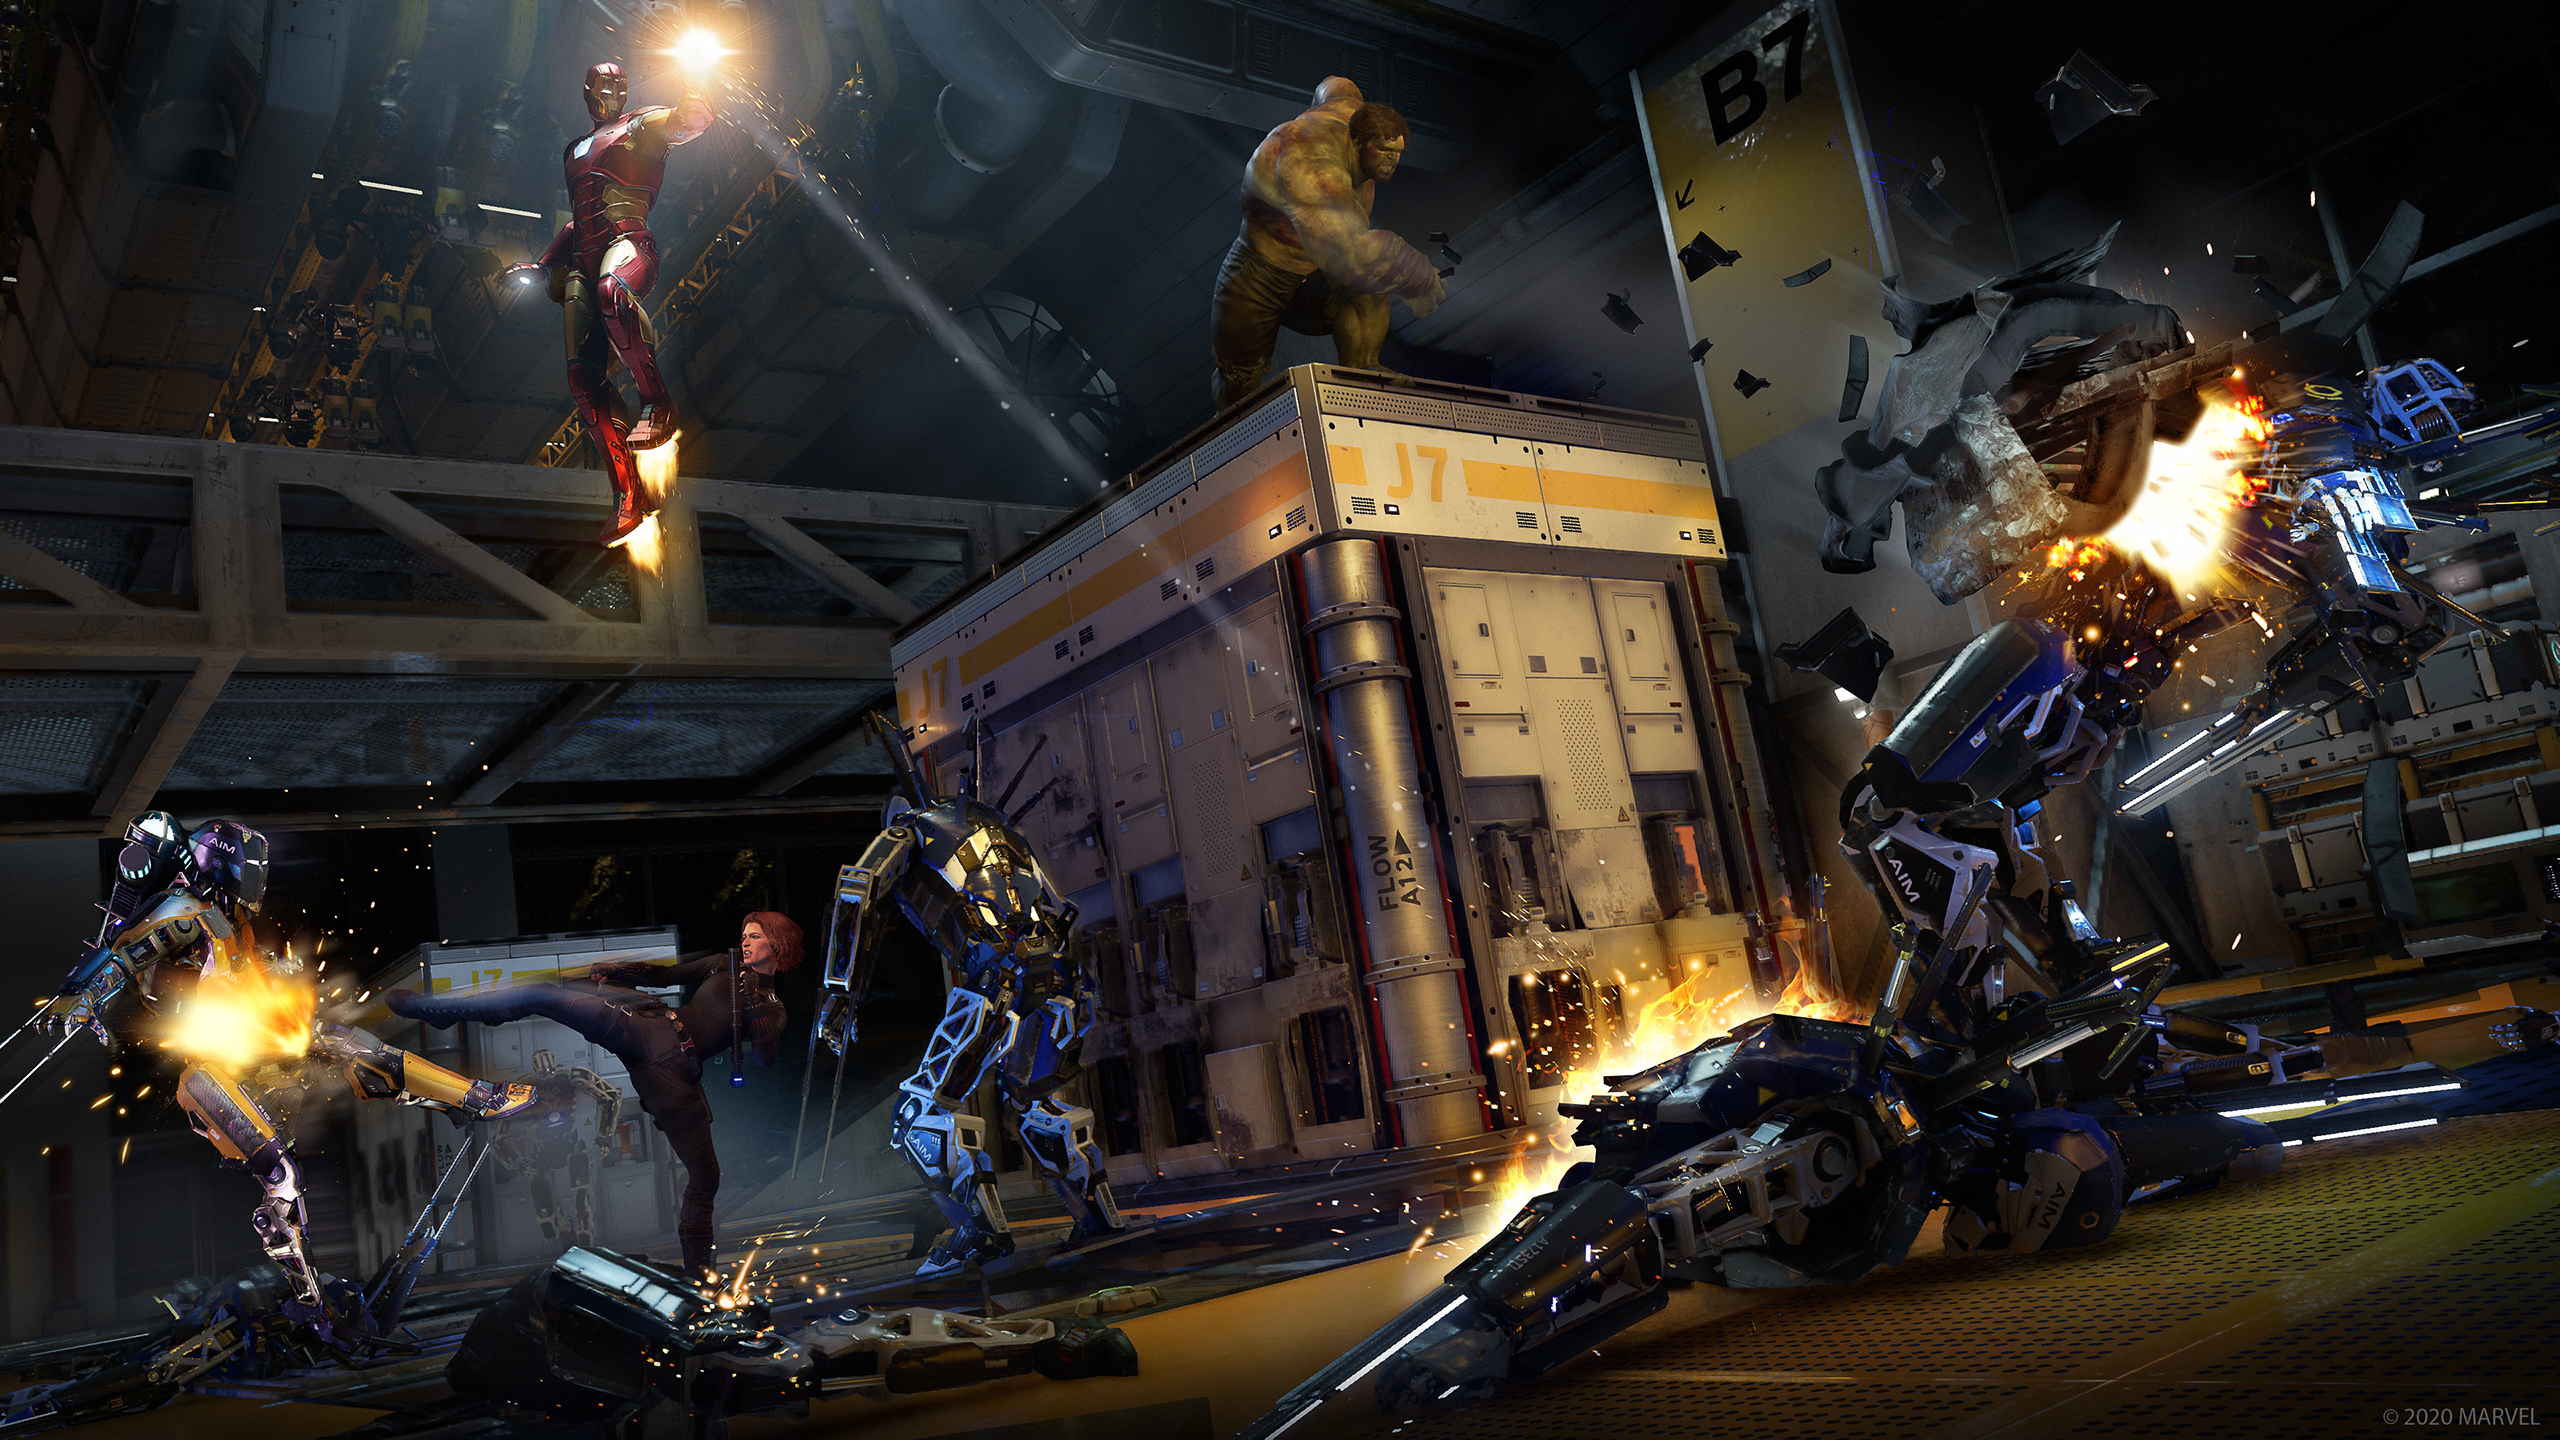 Мстители, собираем лут: Превью Marvel's Avengers